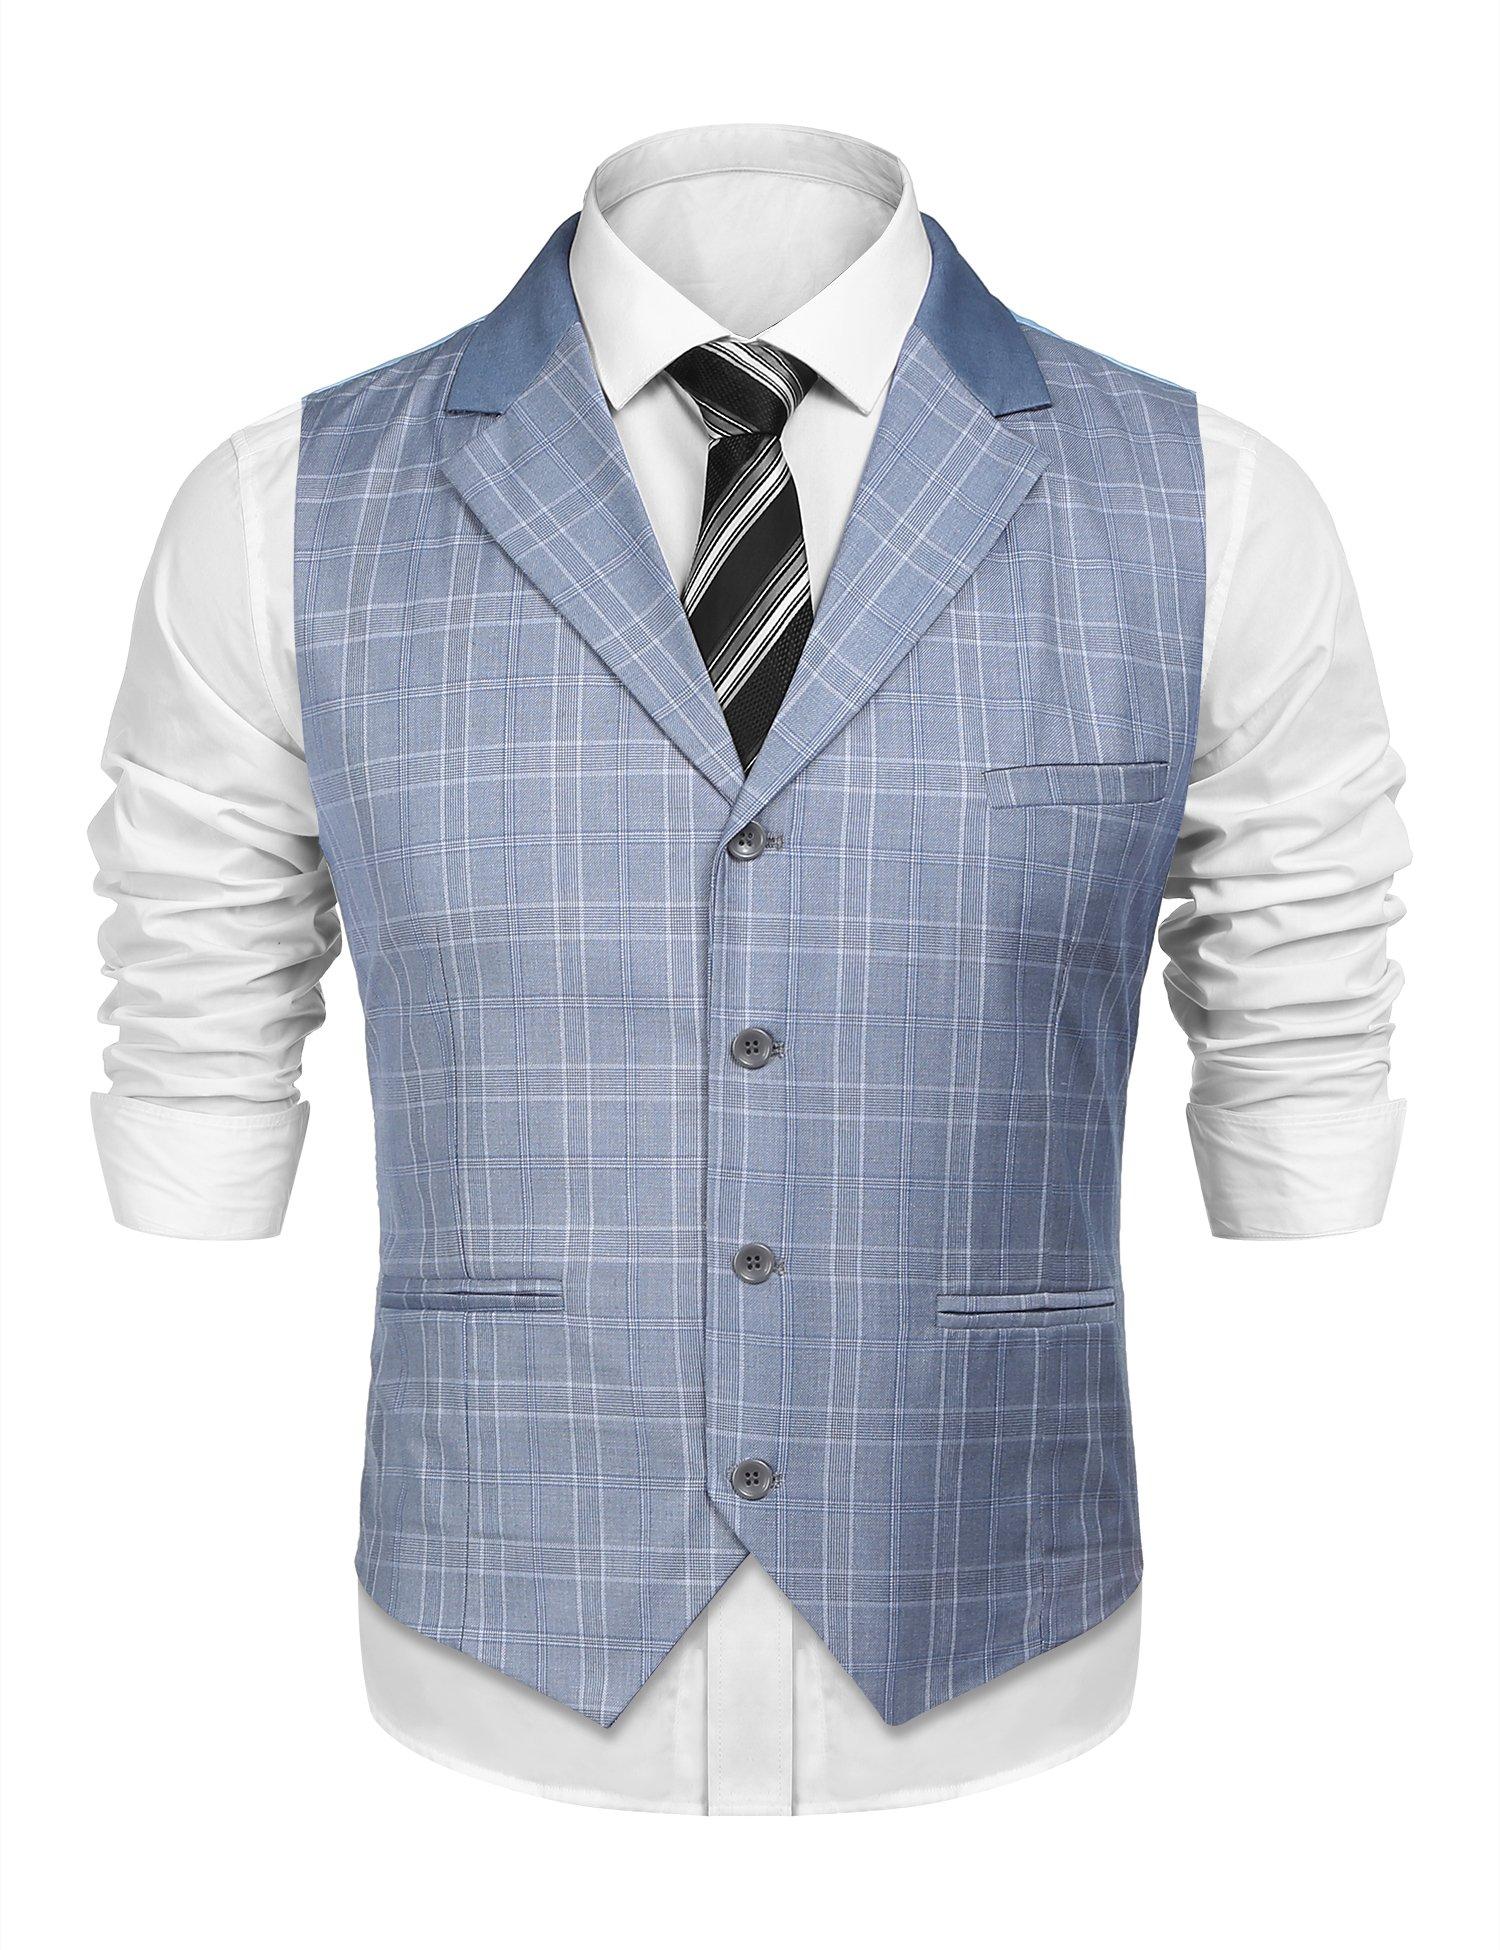 JINIDU Mens Business Suit Vest Casual Lapel Plaid Skinny Waistcoat Sleeveless Jacket